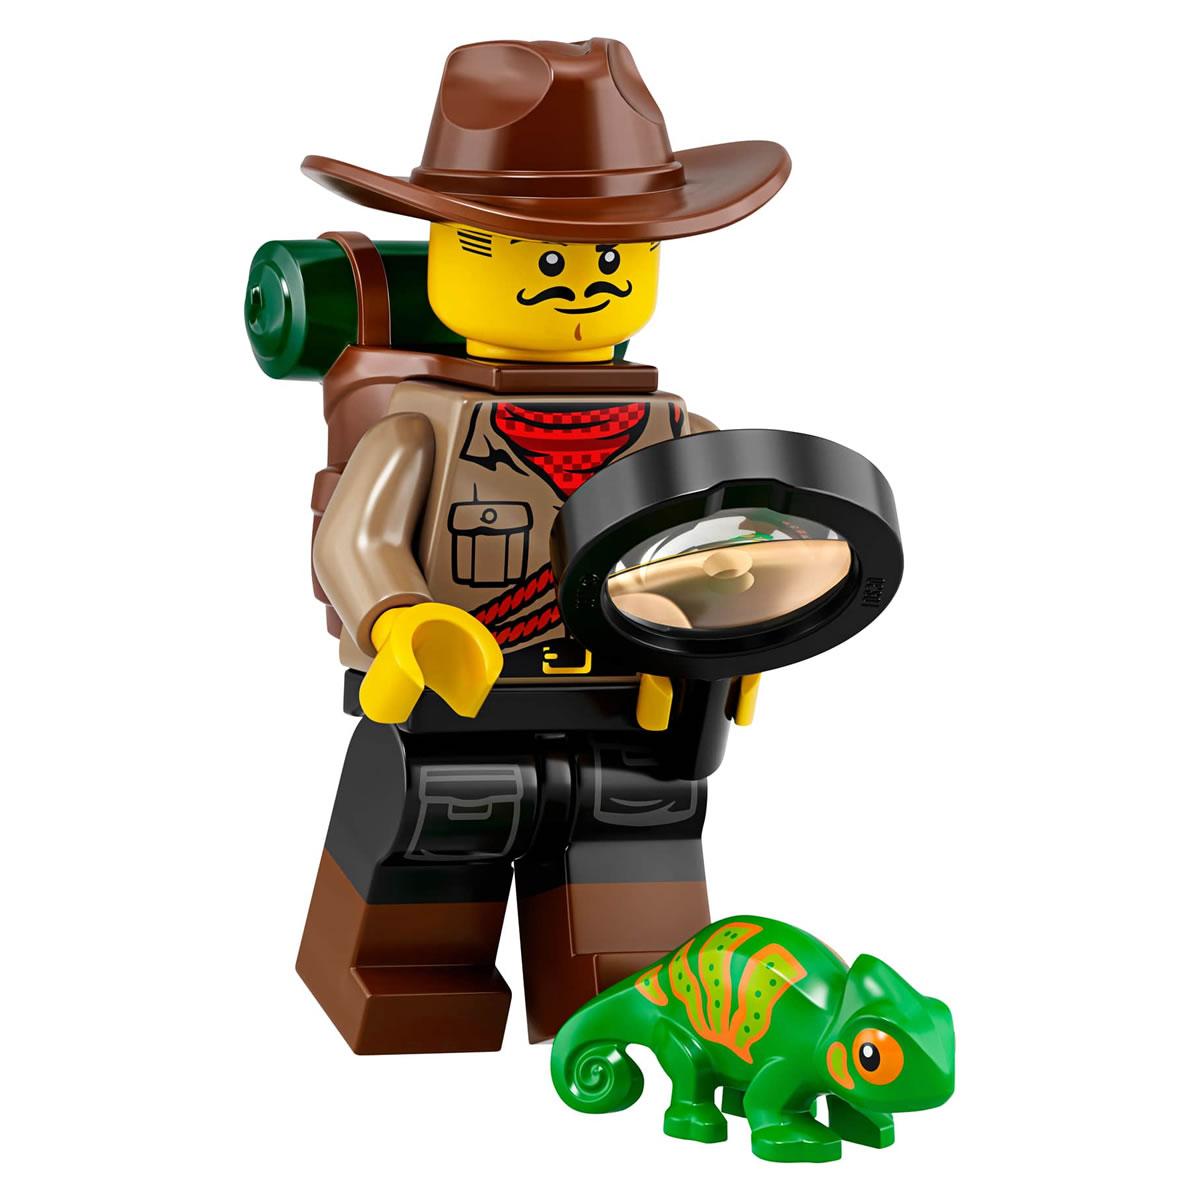 lego-minifiguren-sammelserie-collectible-minifigures-serie-19-71025-2019-11 zusammengebaut.com